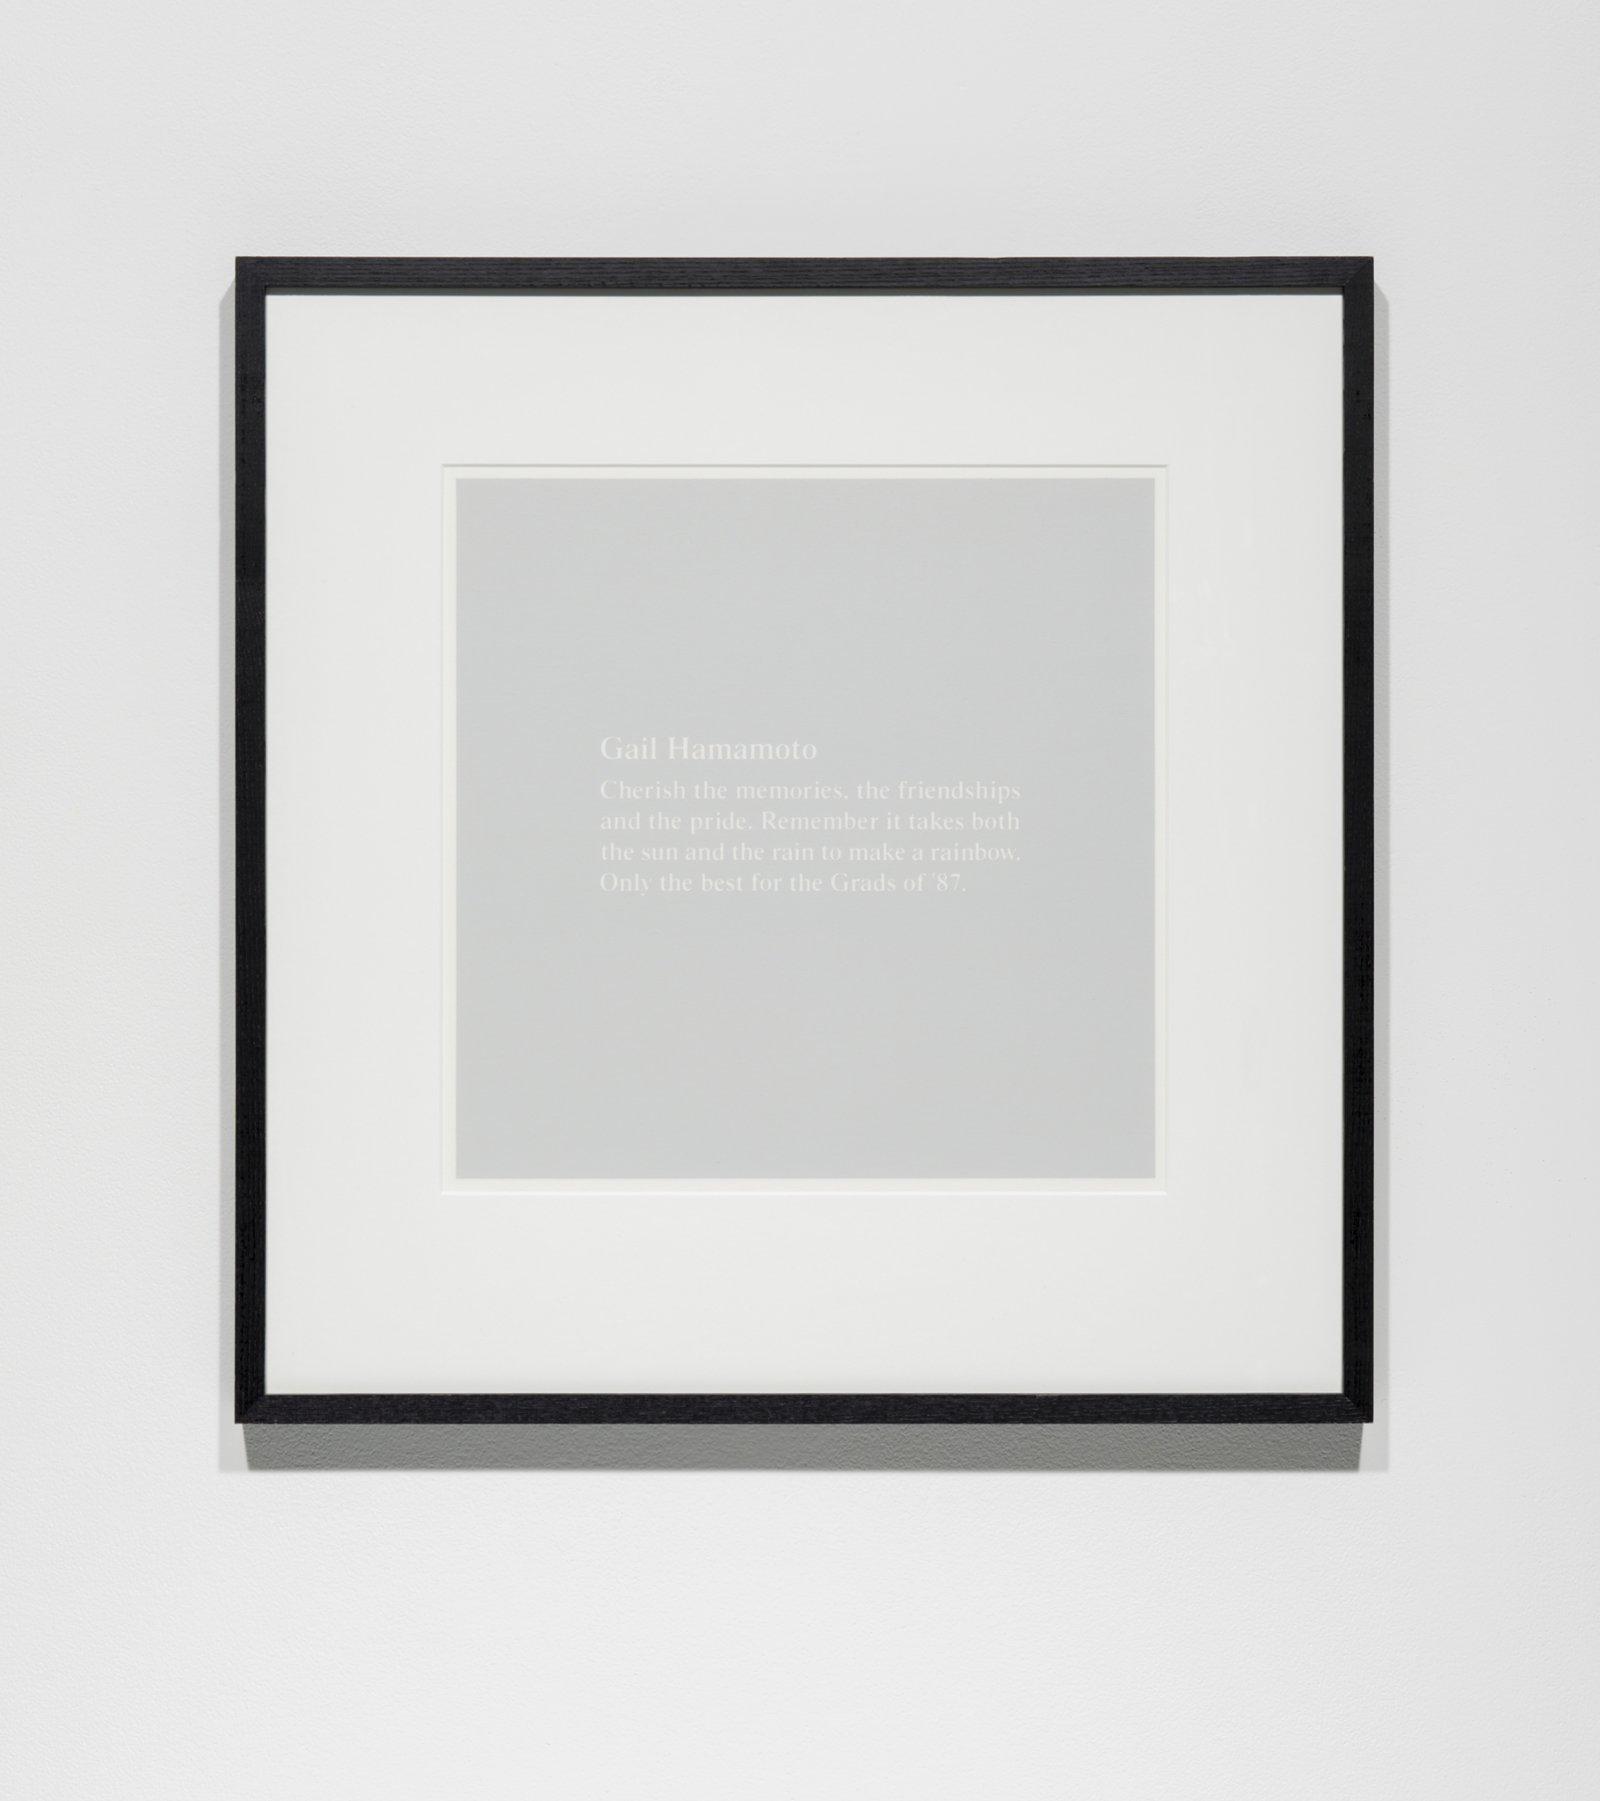 Ron Terada,Grey Painting (Gail Hanamoto…), 1996–1997, acrylic on thermal-resin paper, 24 x 24 in. (60 x 61 cm)